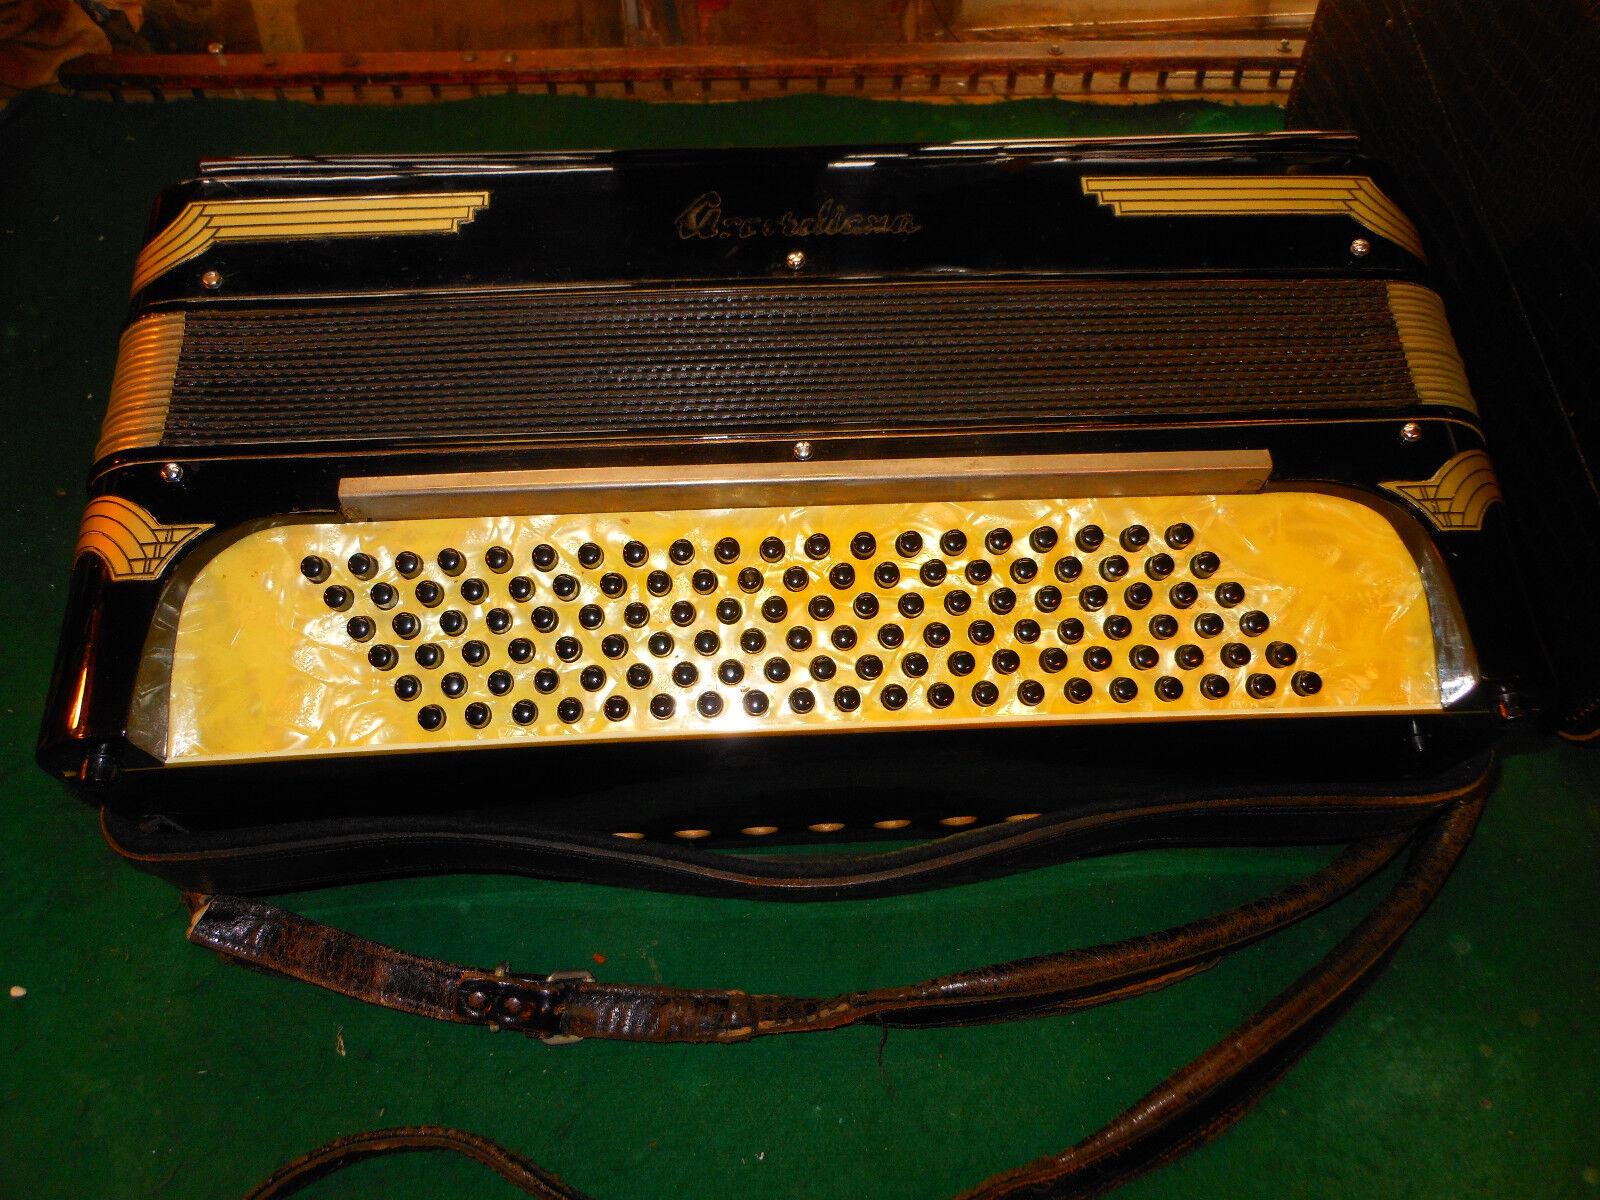 Excelsior Accordiana - Antique 4 5 Reeds Reeds Reeds Sounds Incrotible - Vintage Accordion 8d5e5f